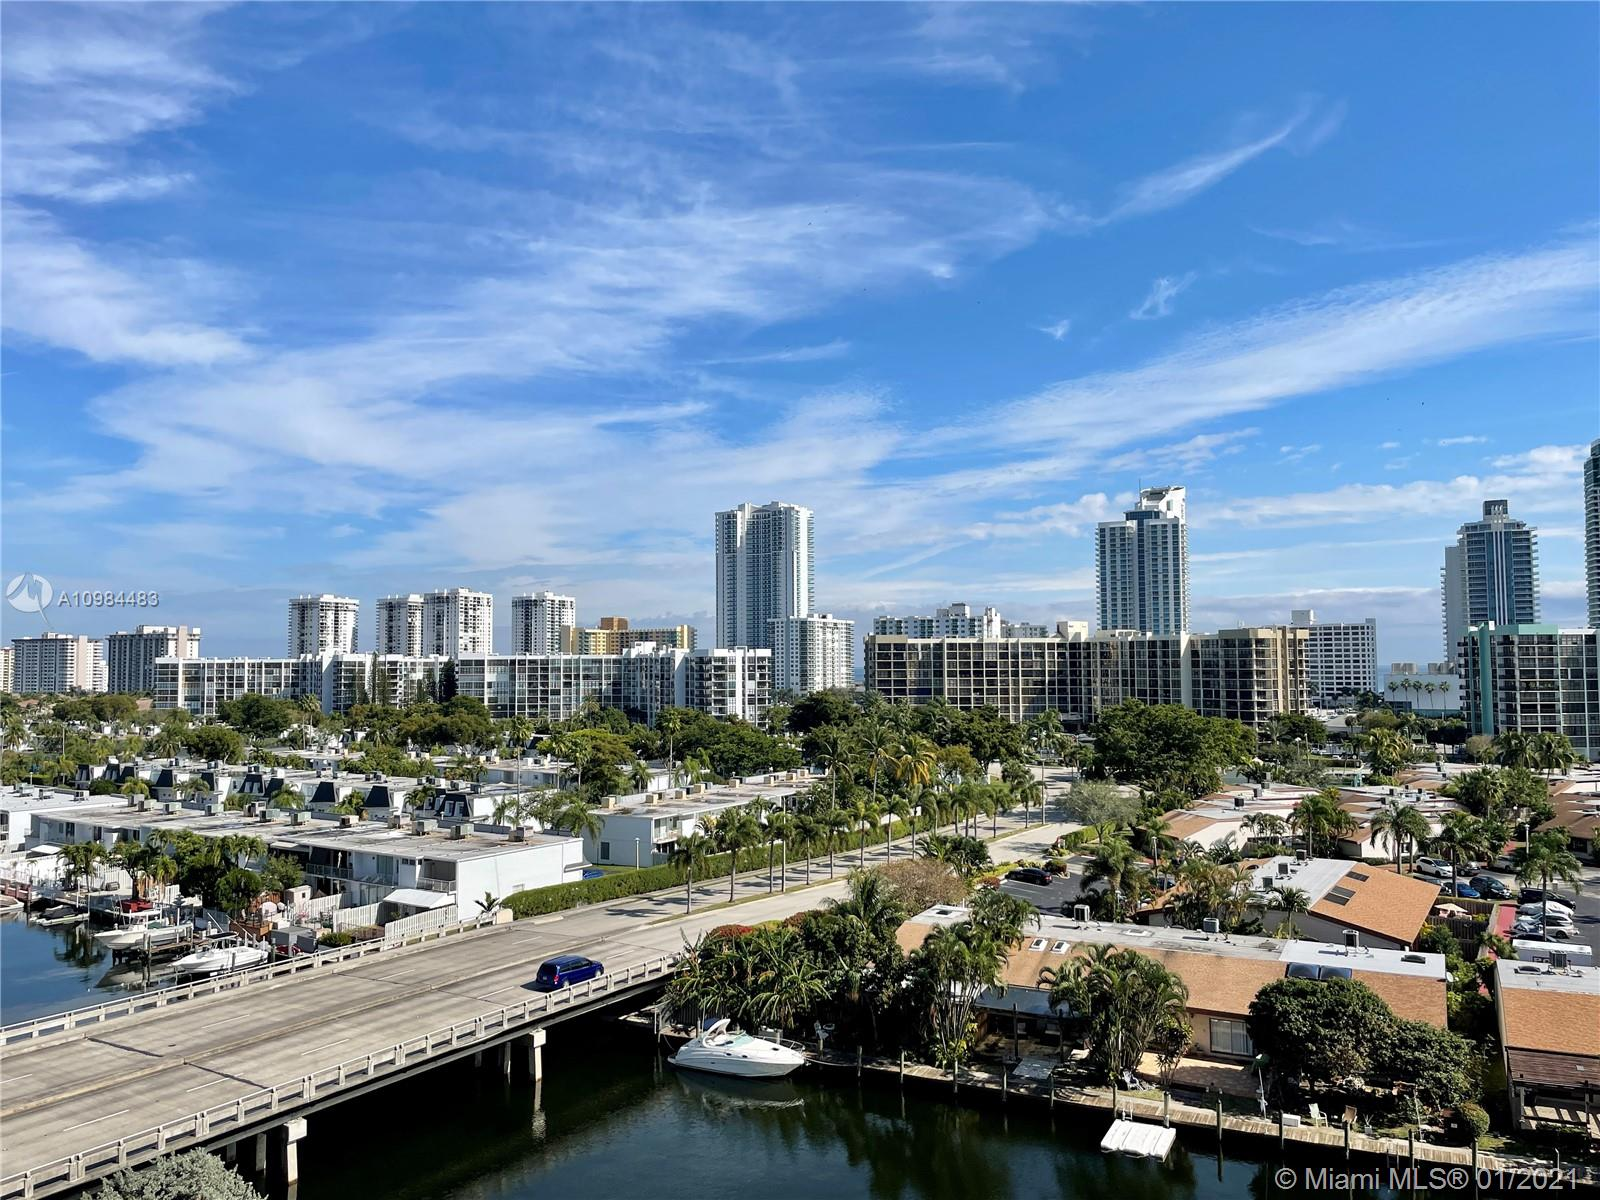 Olympus C #907 - 2500 Parkview Dr #907, Hallandale Beach, FL 33009